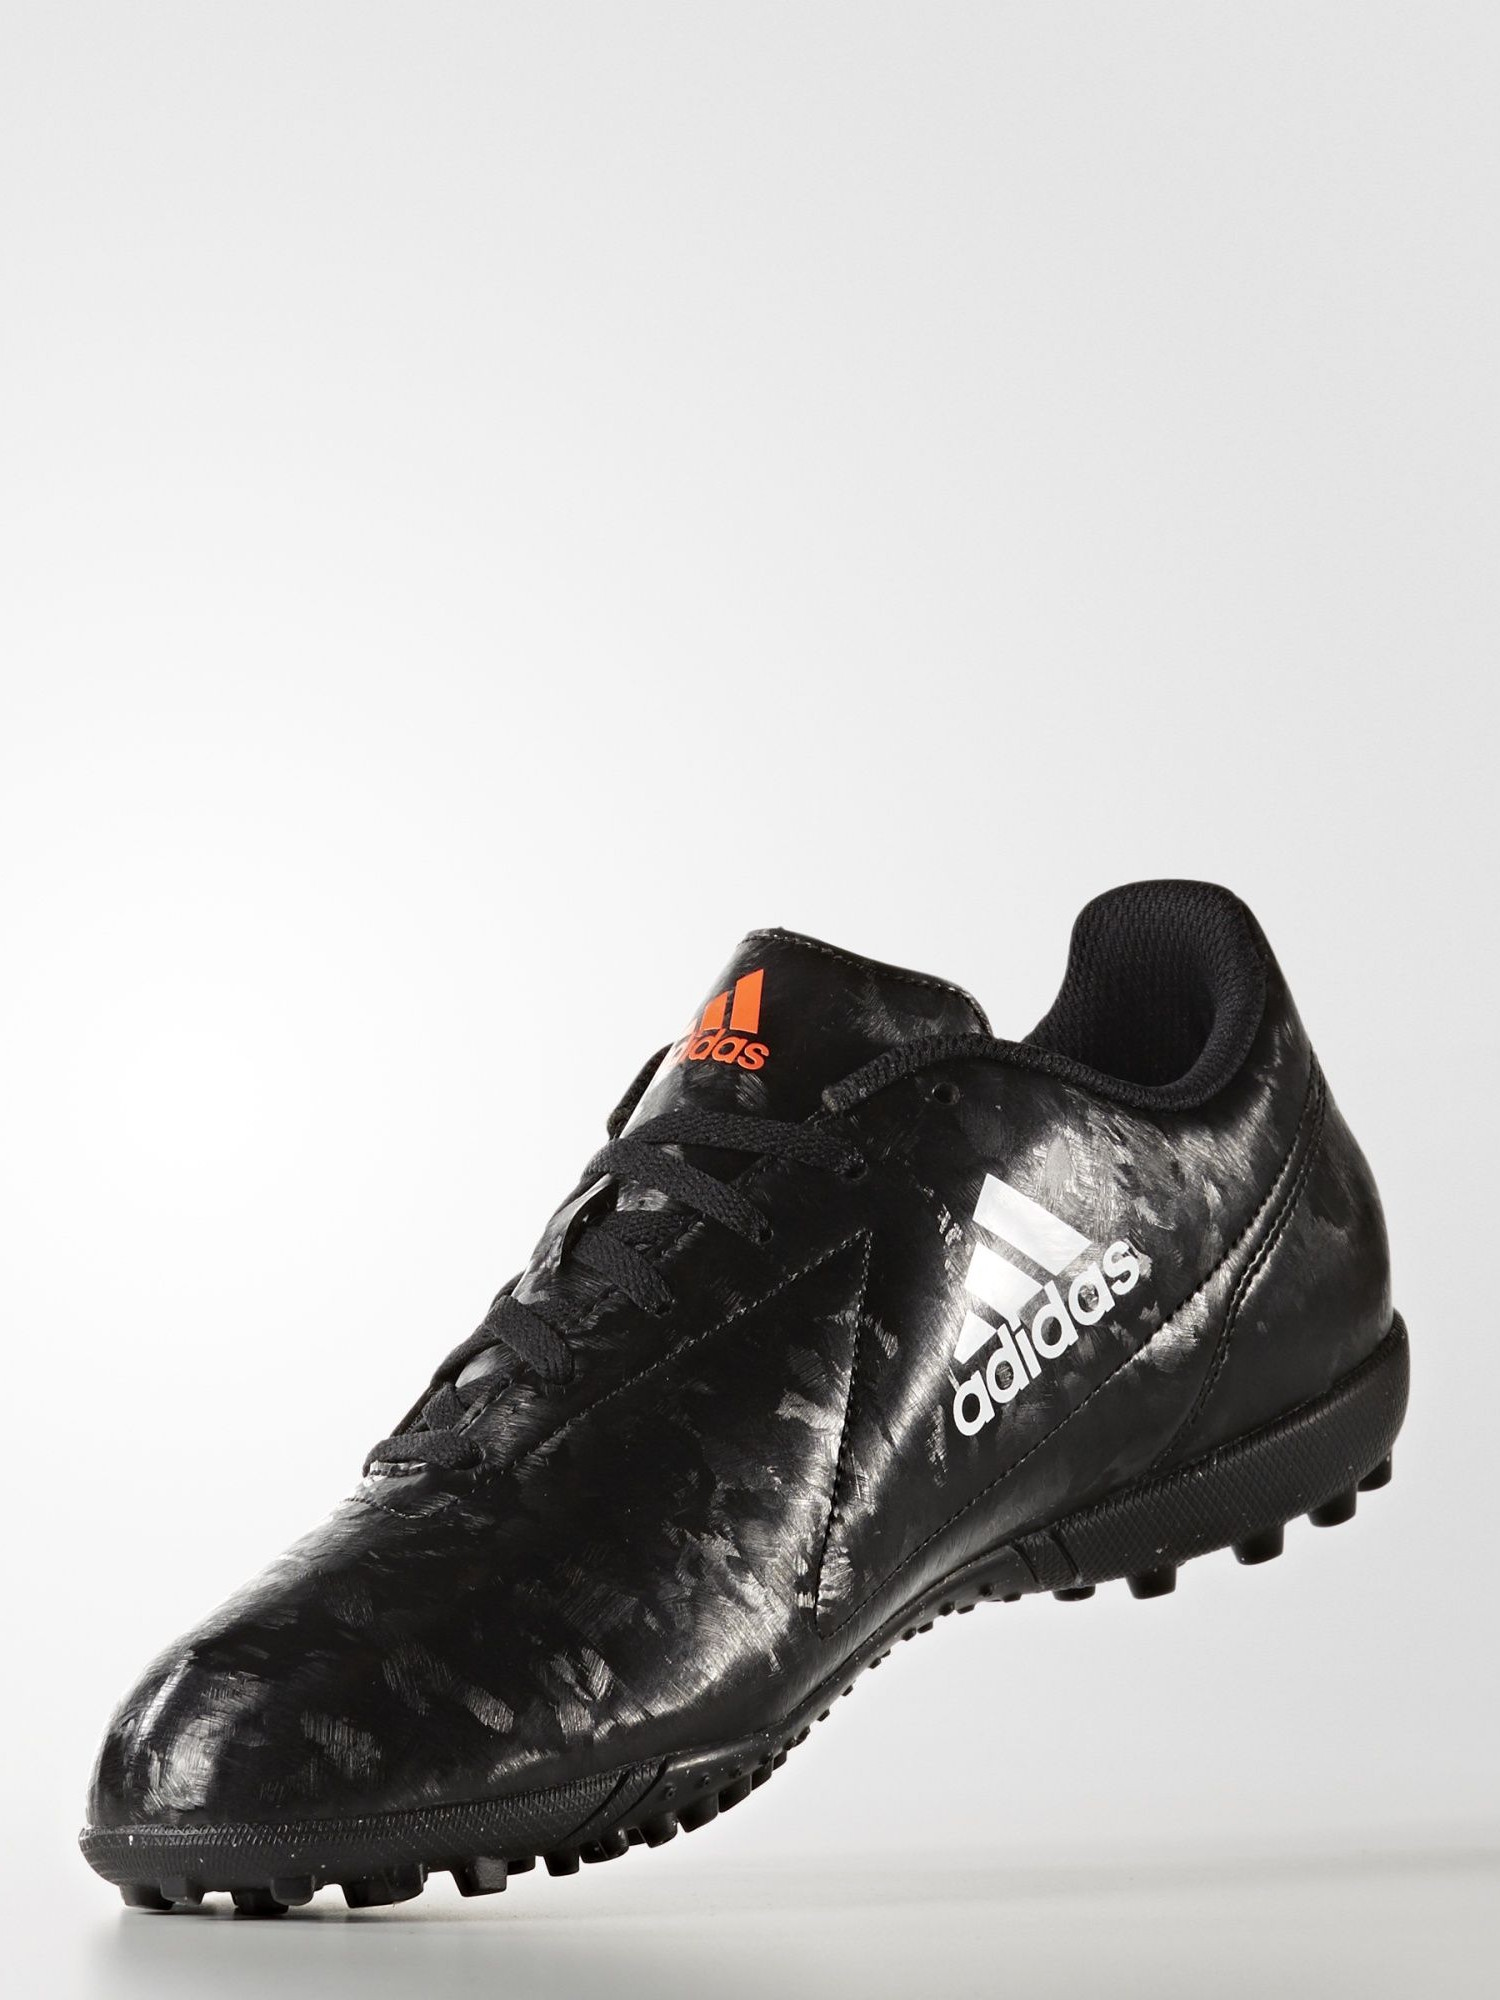 Fútbol shoes Adidas Botas conquistó II Noir sala Césped Entrenadores 5 5 de  8 ... 486e4c96df15f